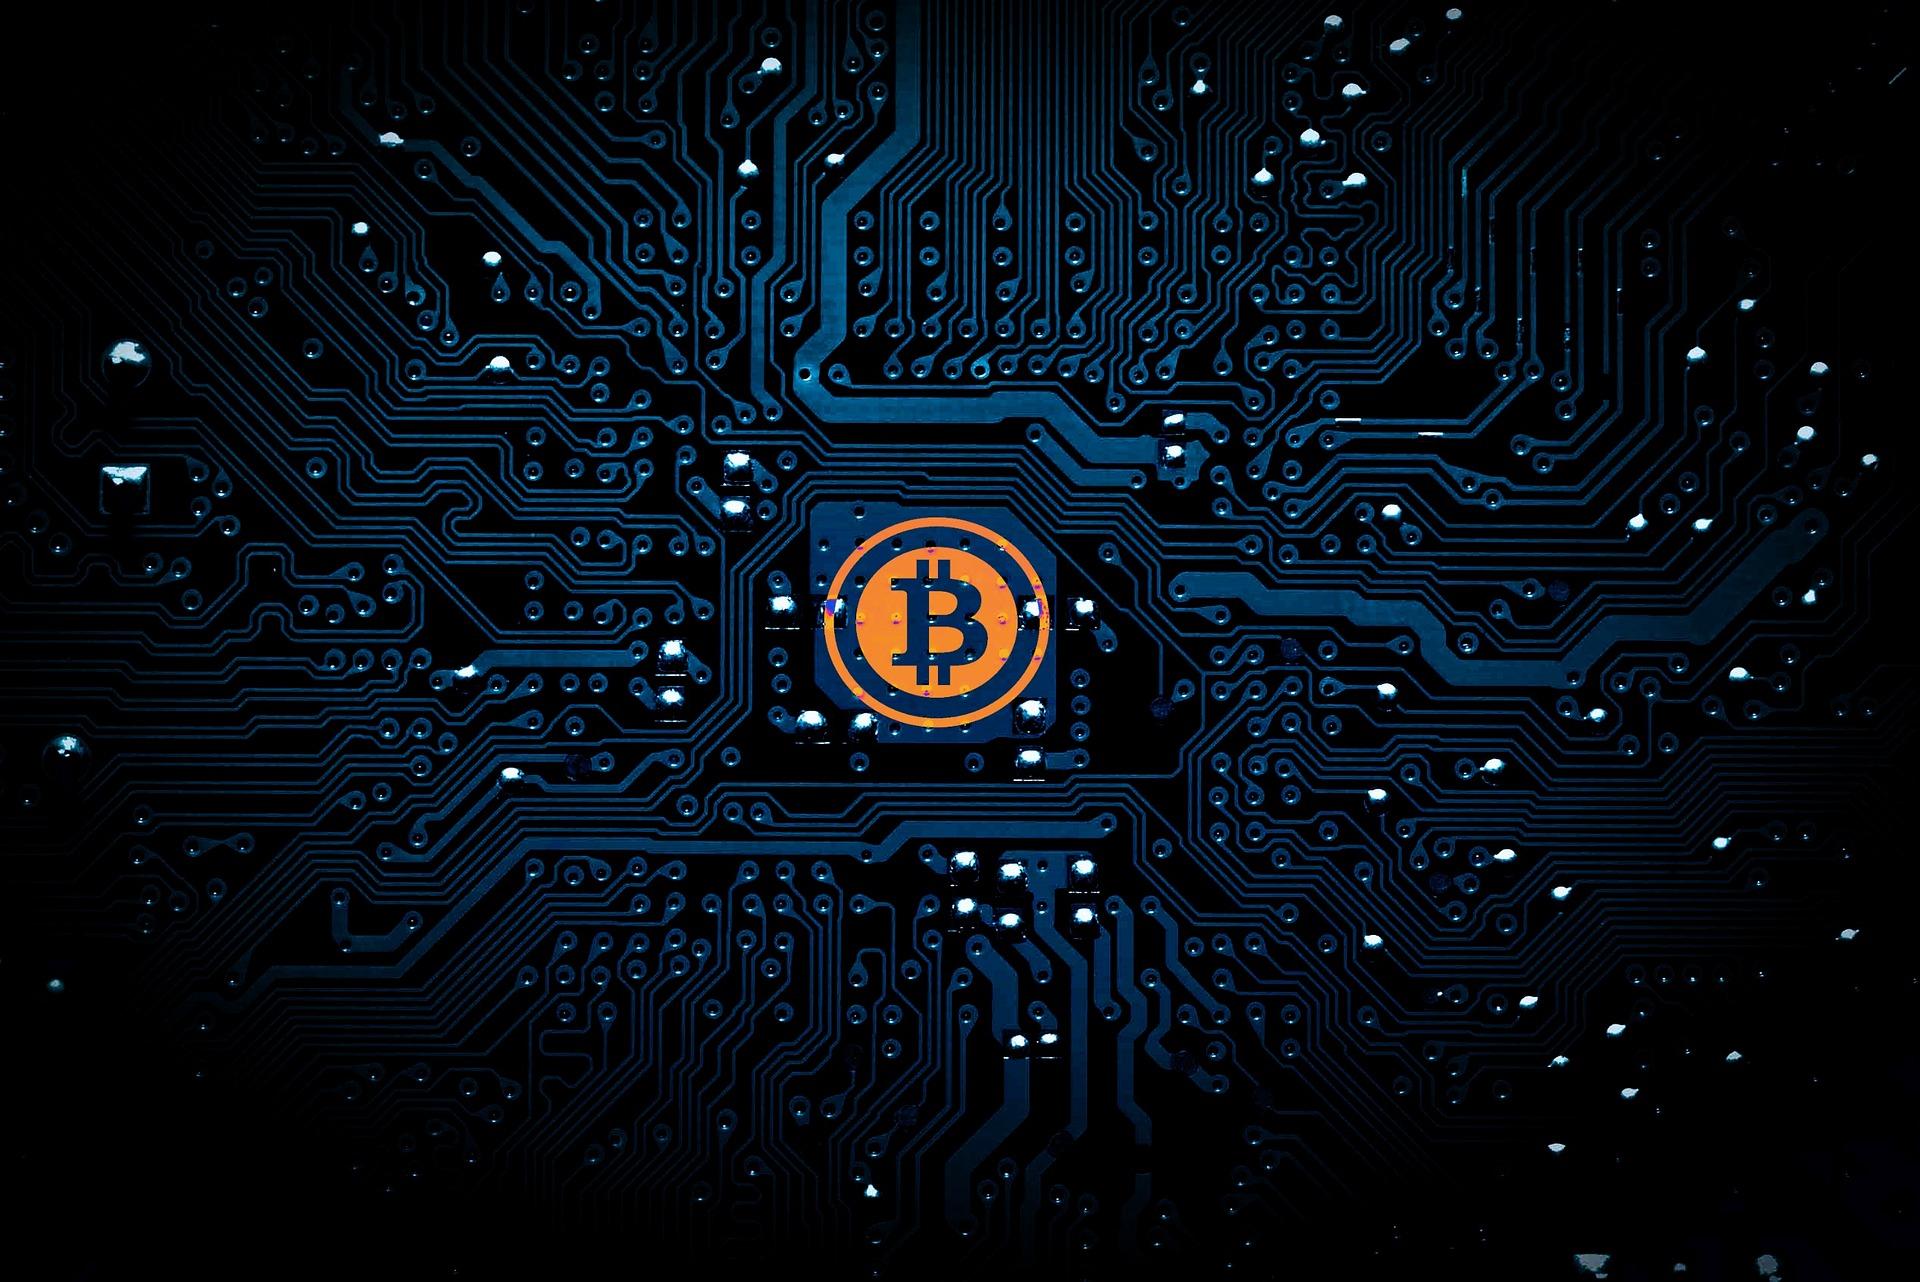 Bitcoin sotto i 30k, violento sell-off